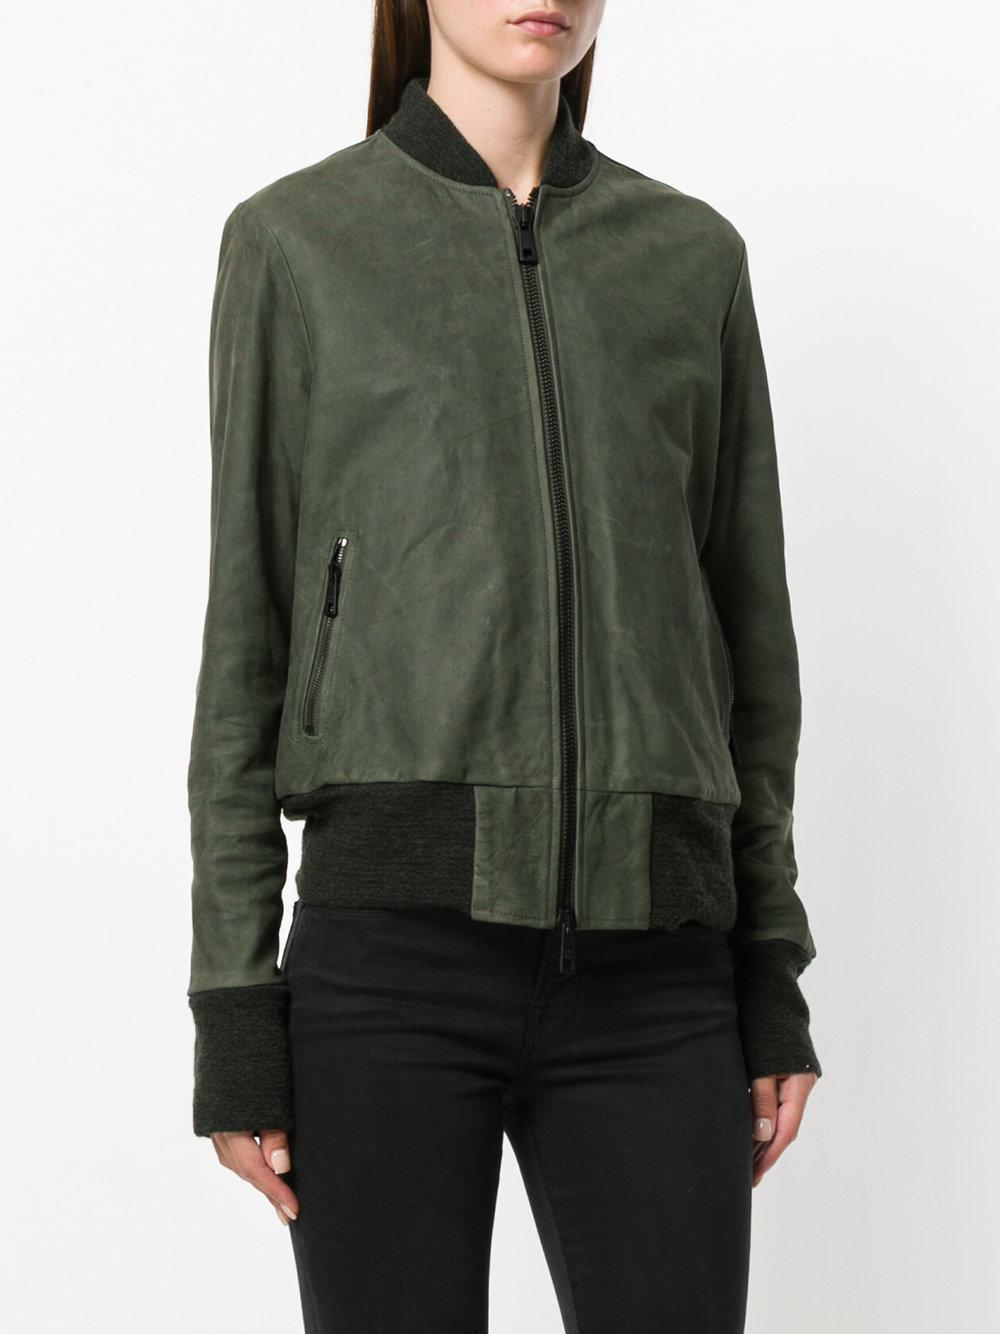 Giorgio Brato Leather Zipped Jacket in Green for Men